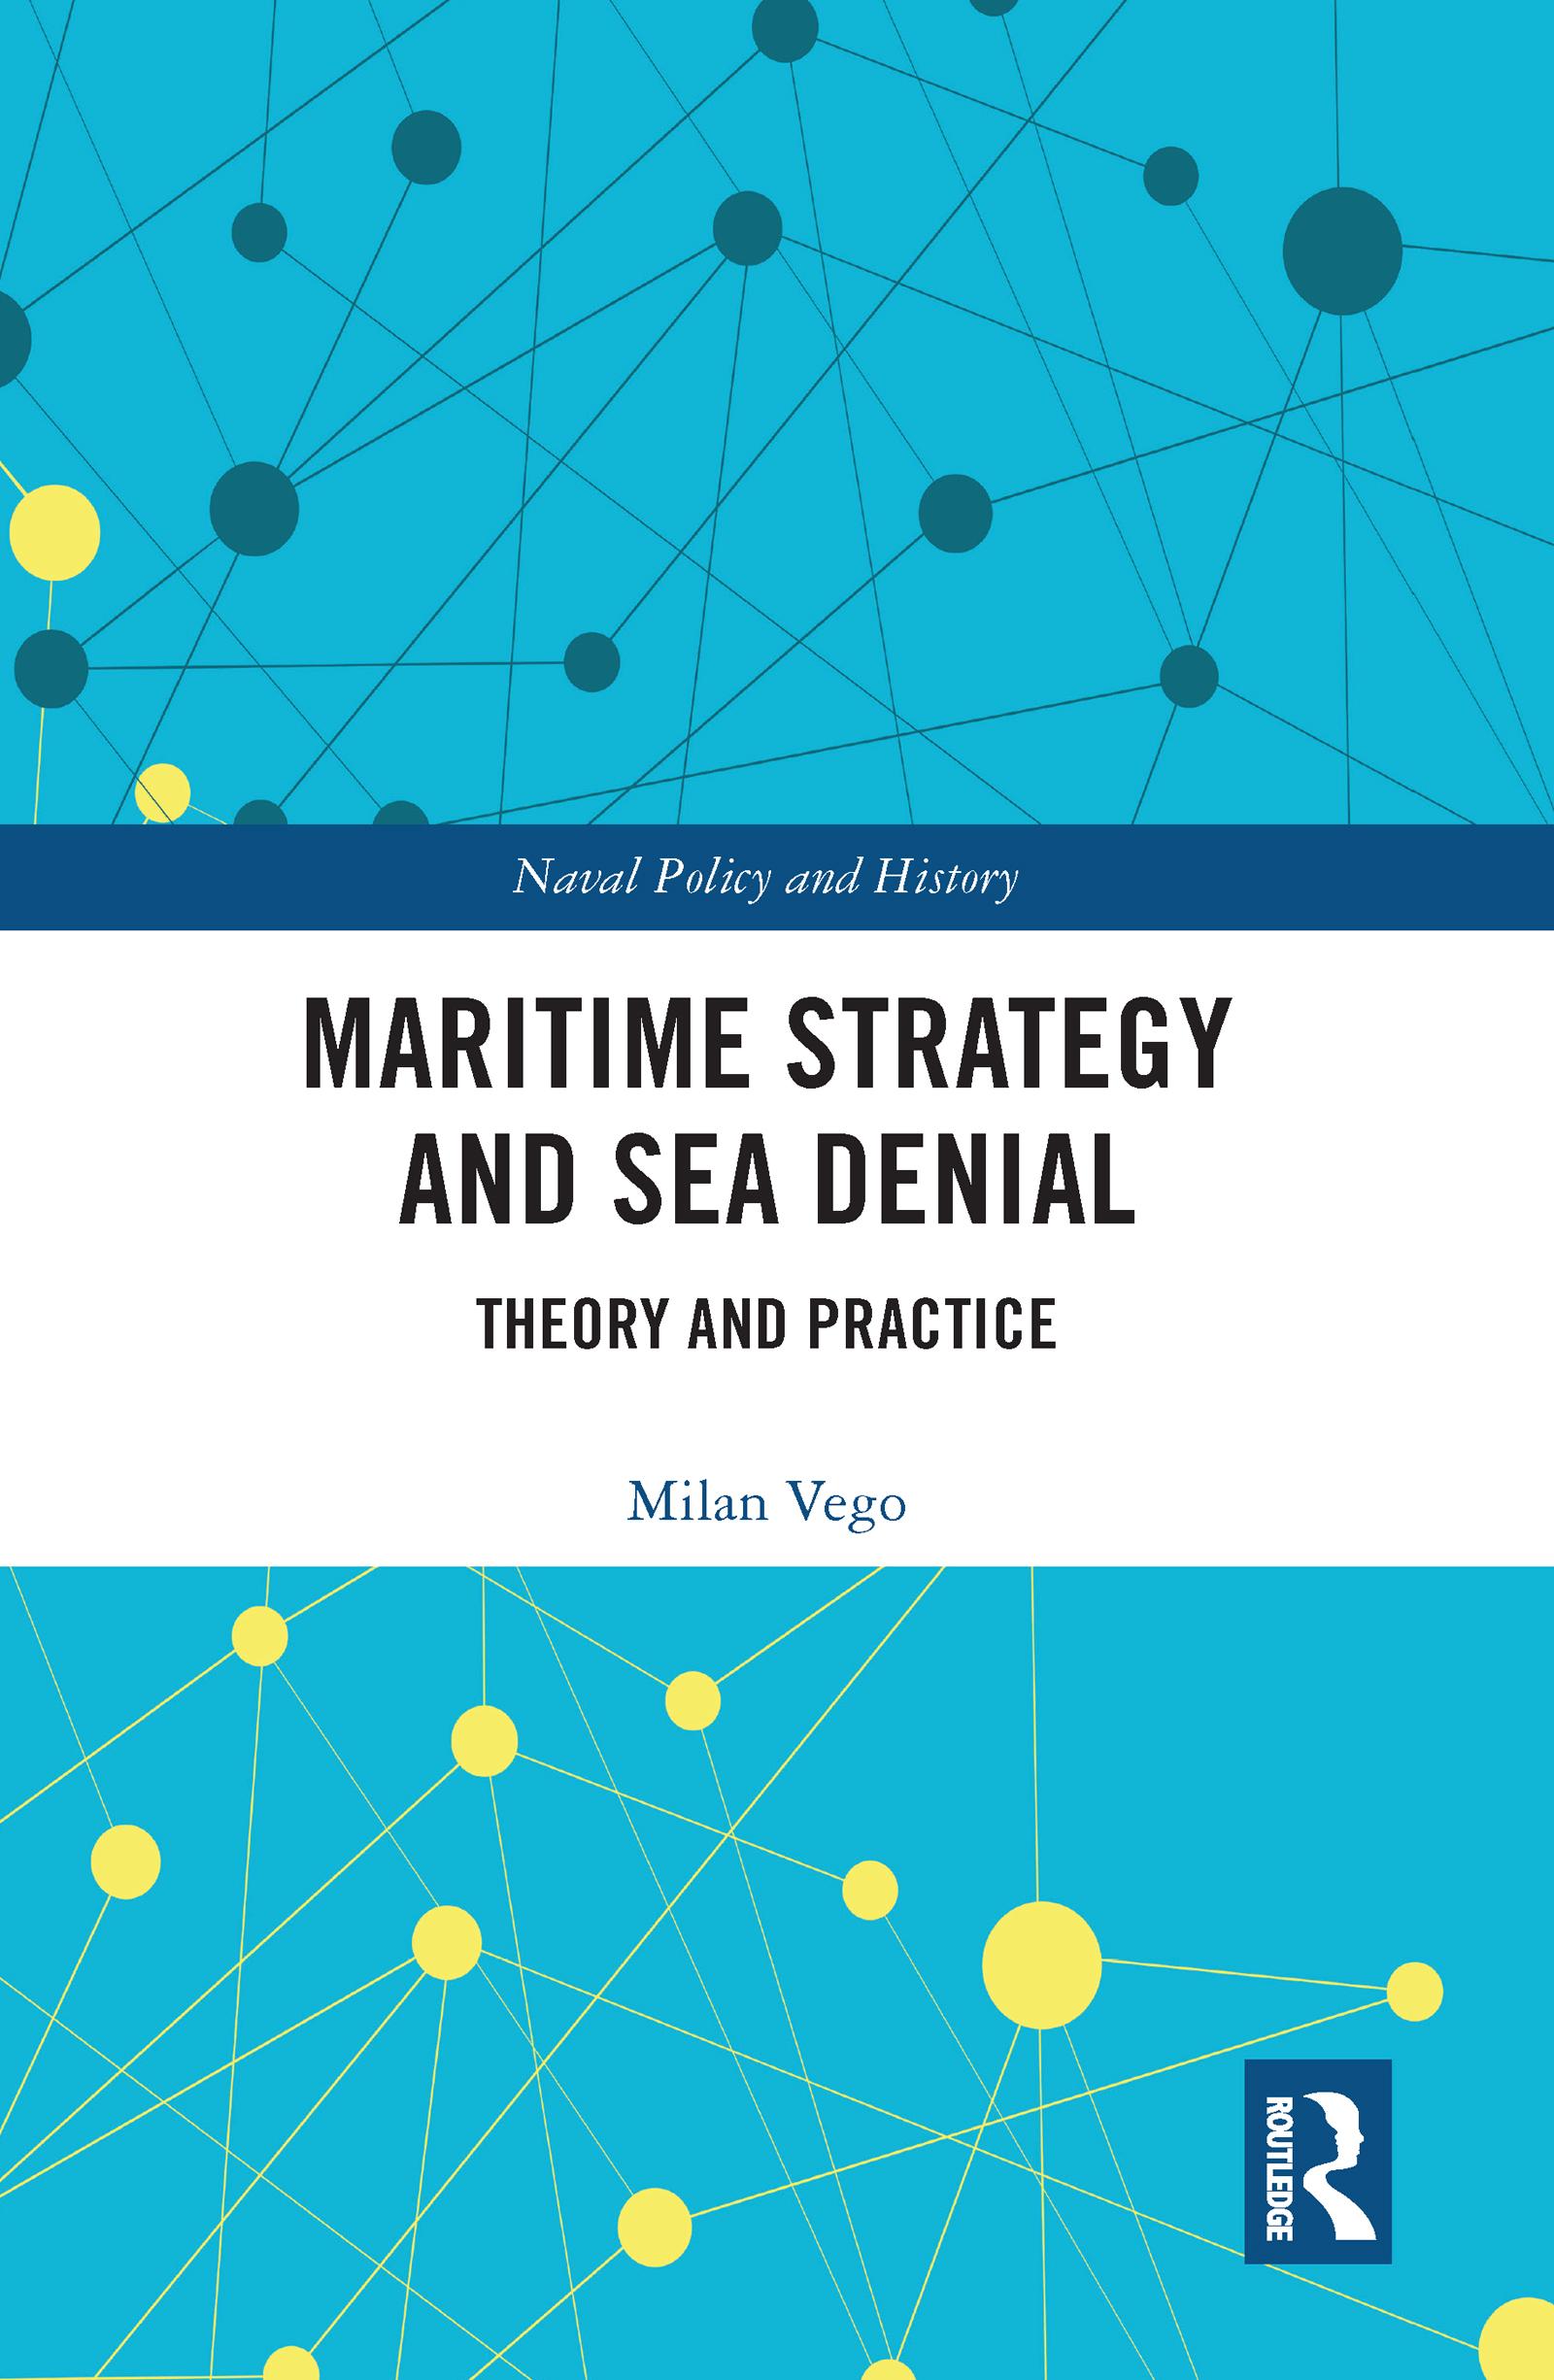 Maritime Strategy and Sea Denial